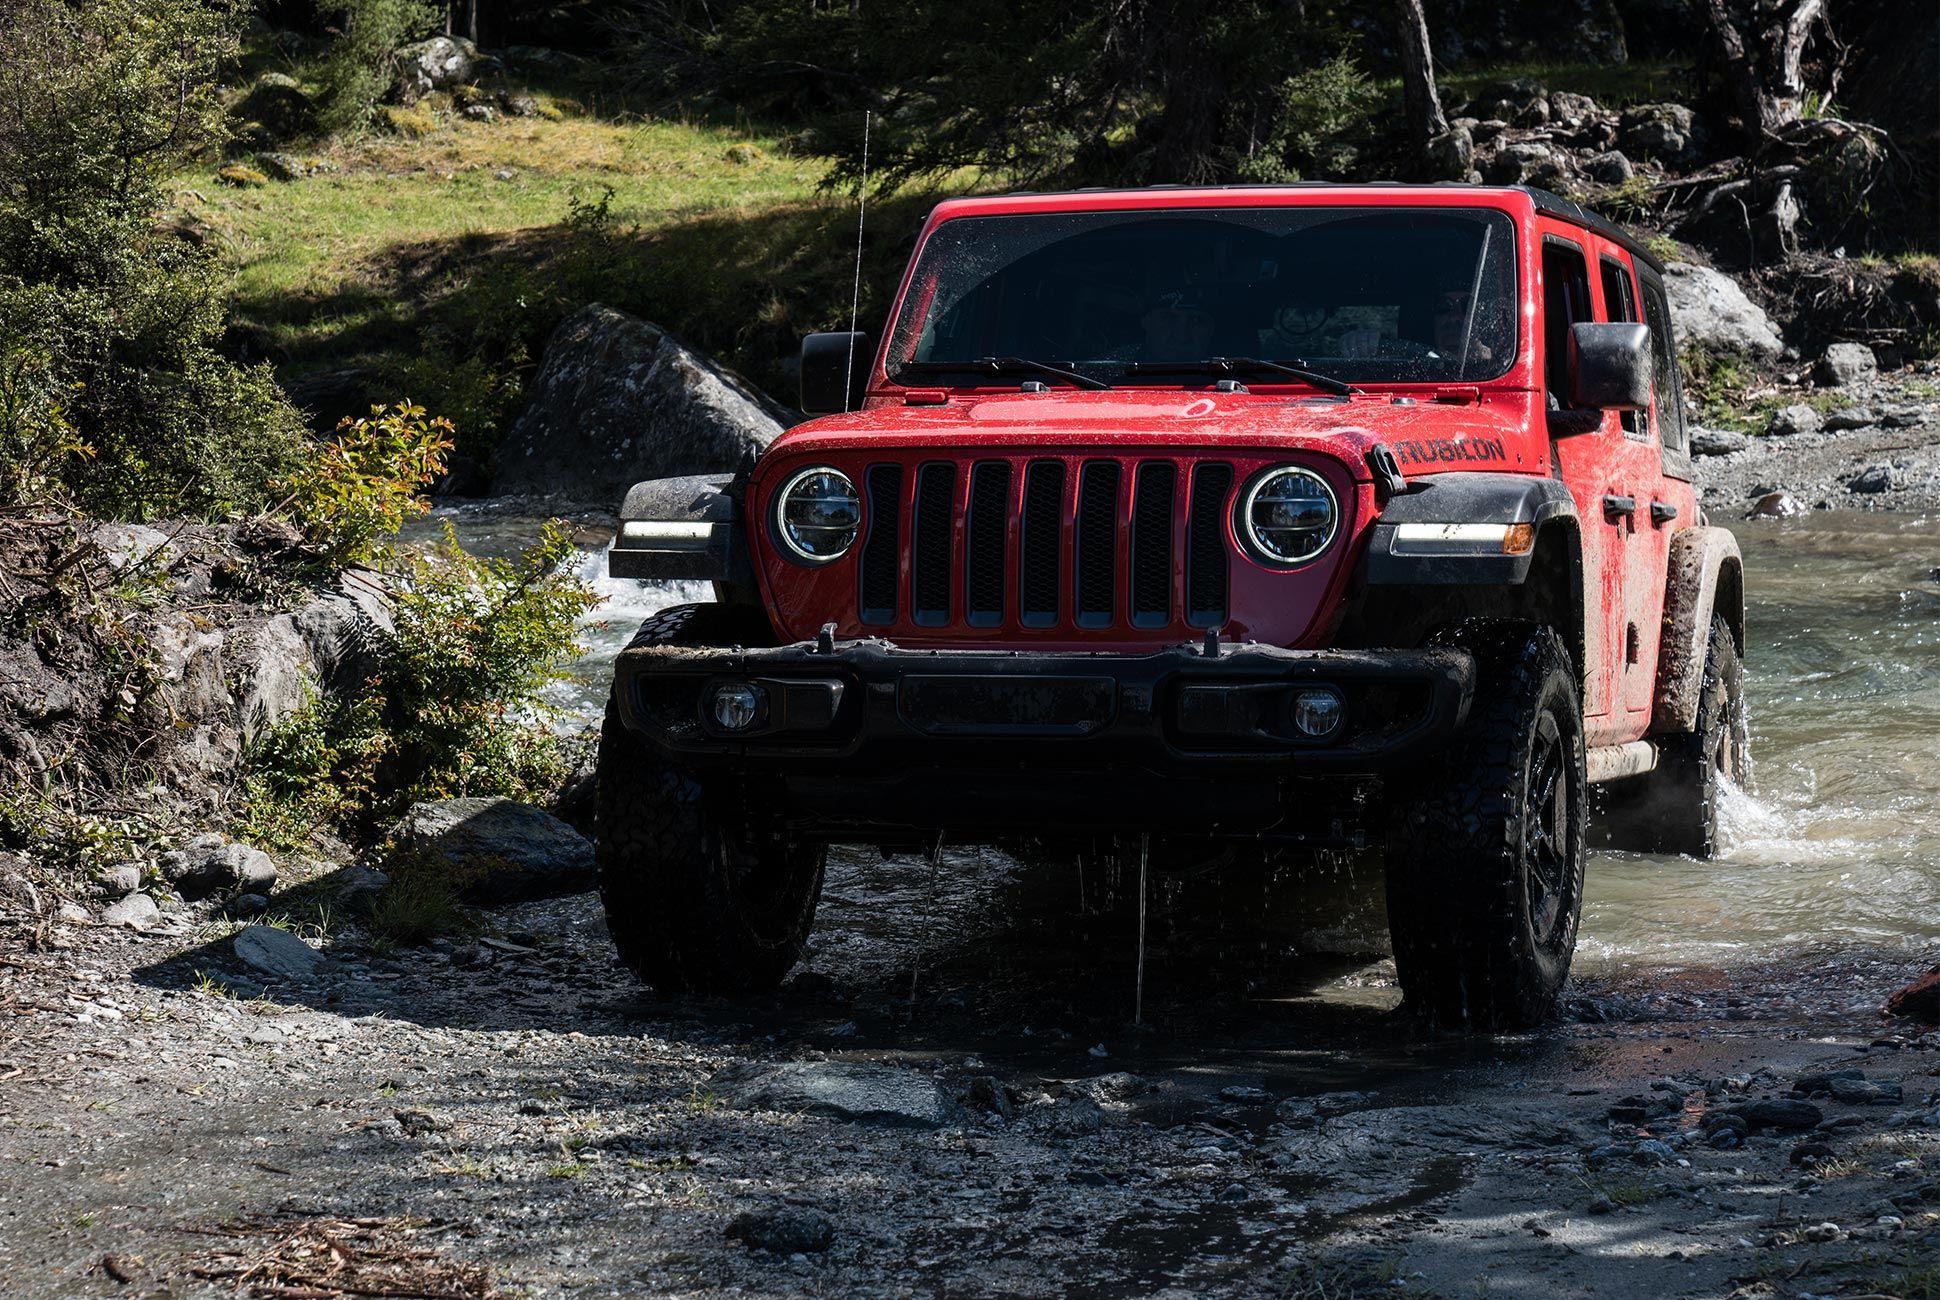 2018-Jeep-Wrangler-Review-gear-patrol-5